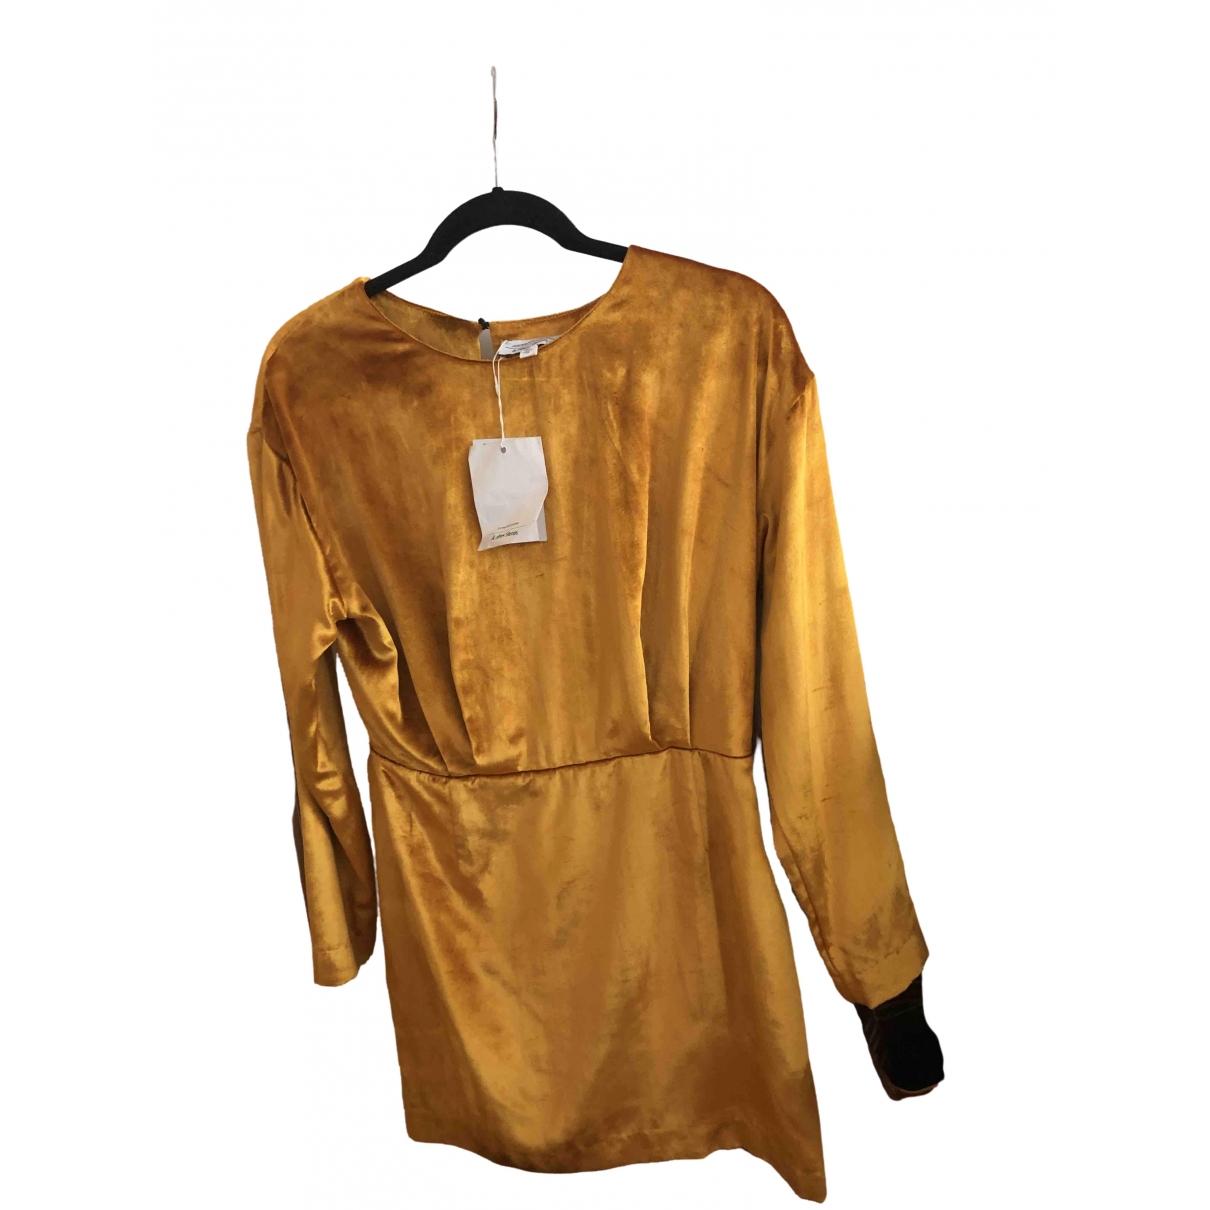 & Stories \N Yellow dress for Women 38 FR